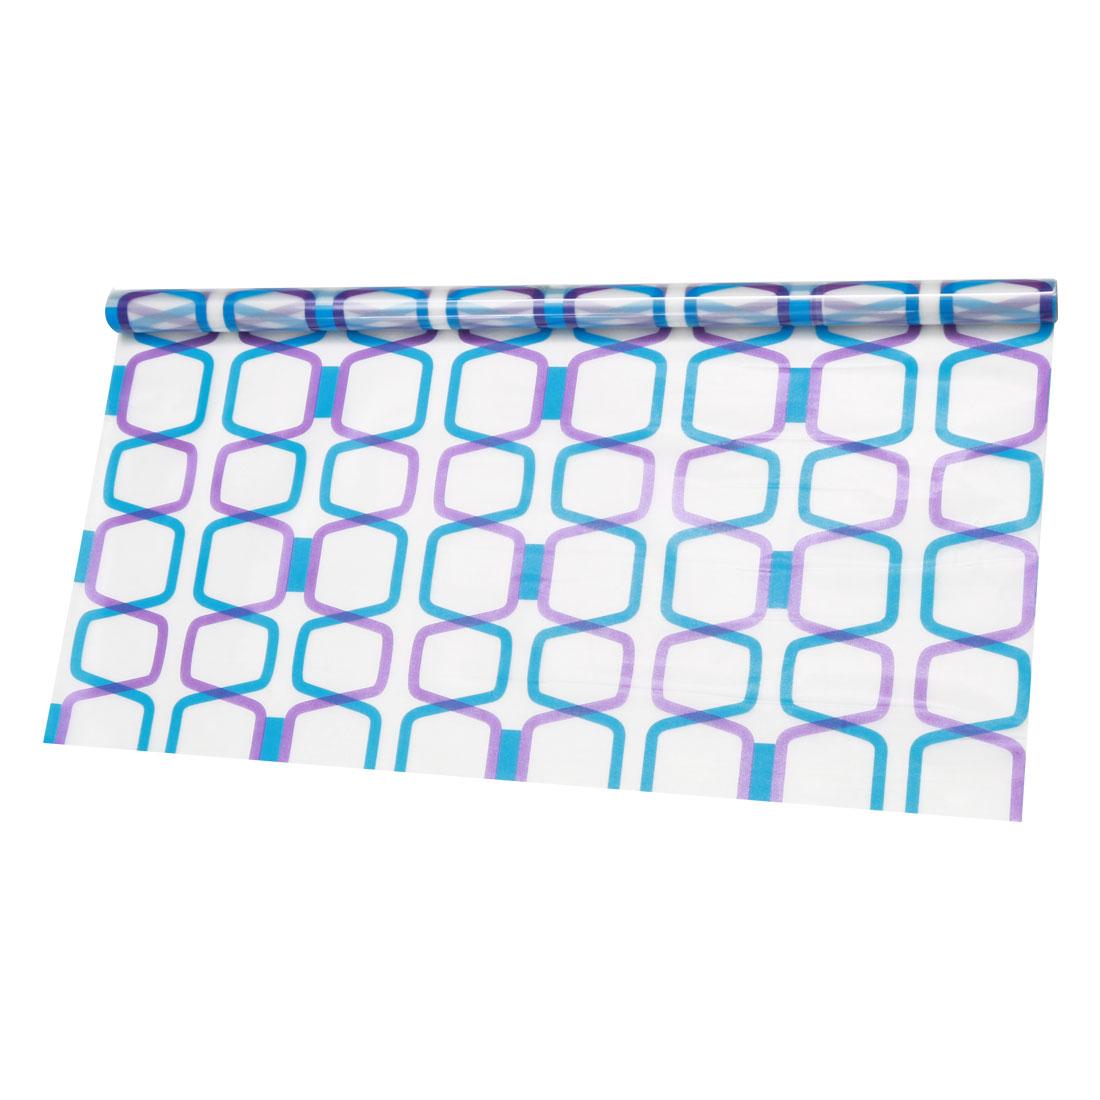 PVC 23.6 x 78.7 Inch Anti UV Glass Window Film Sticker Diamond Pattern